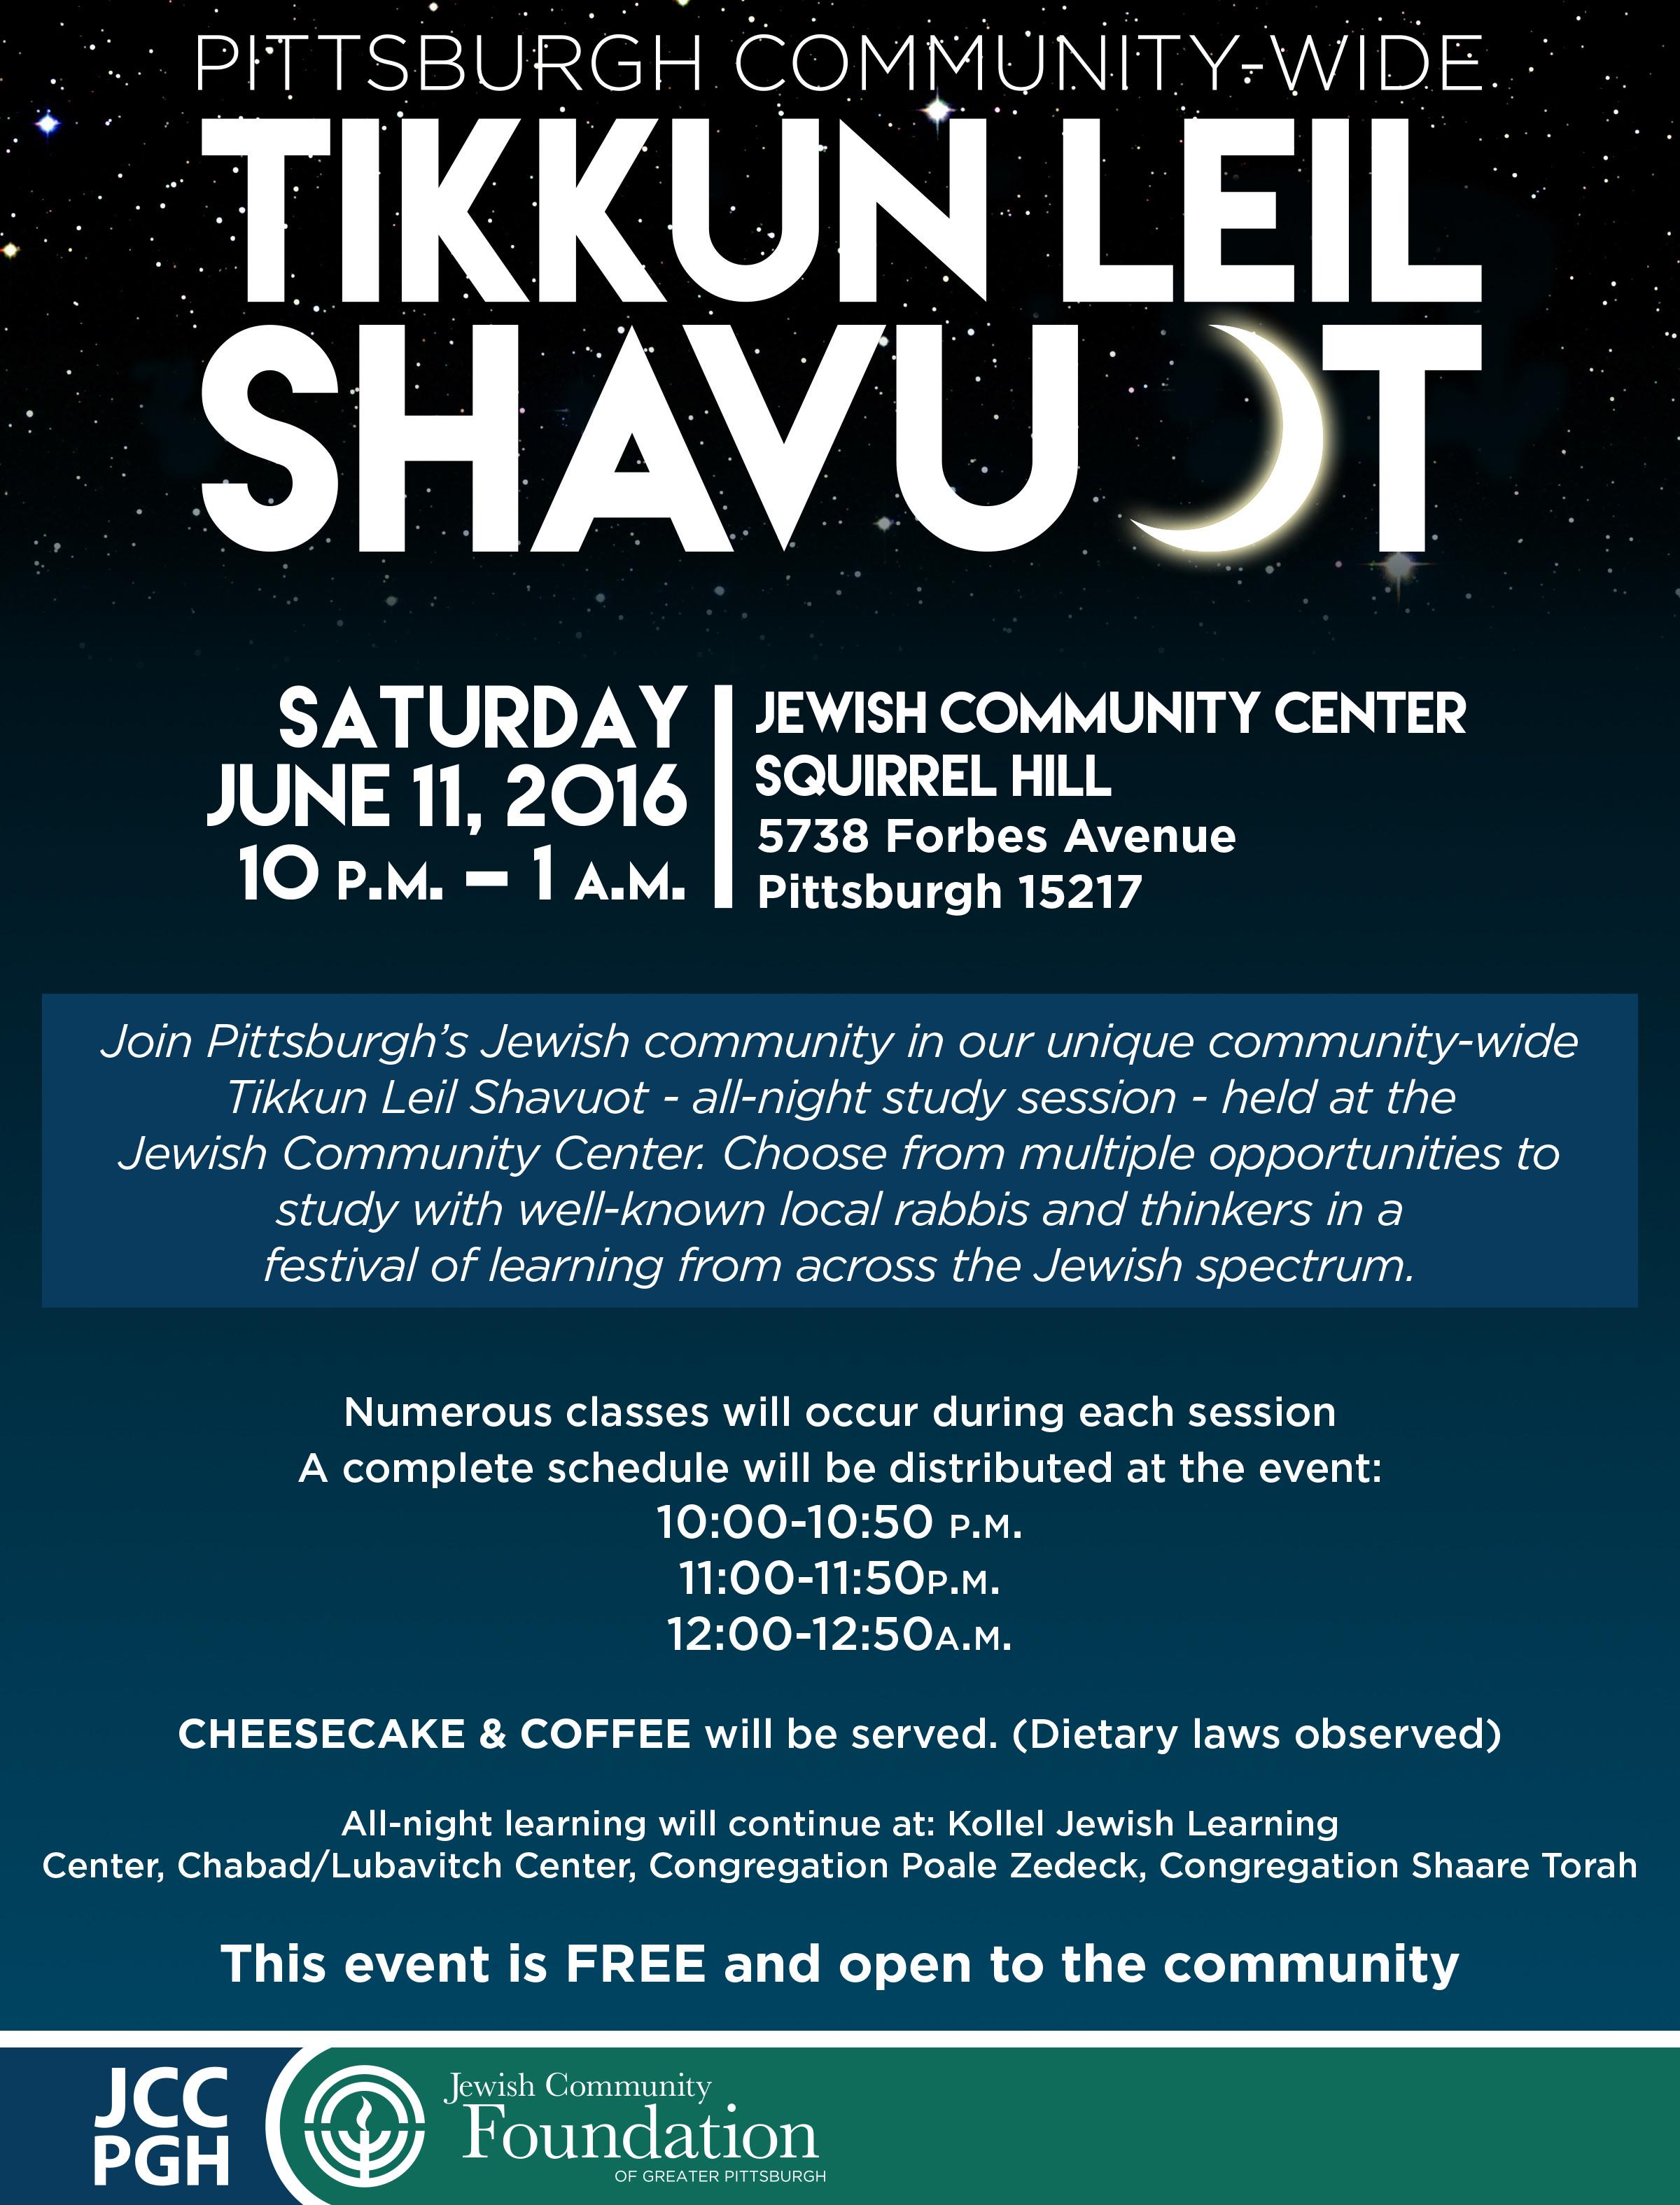 Shabbat Shalom Pittsburgh Federation